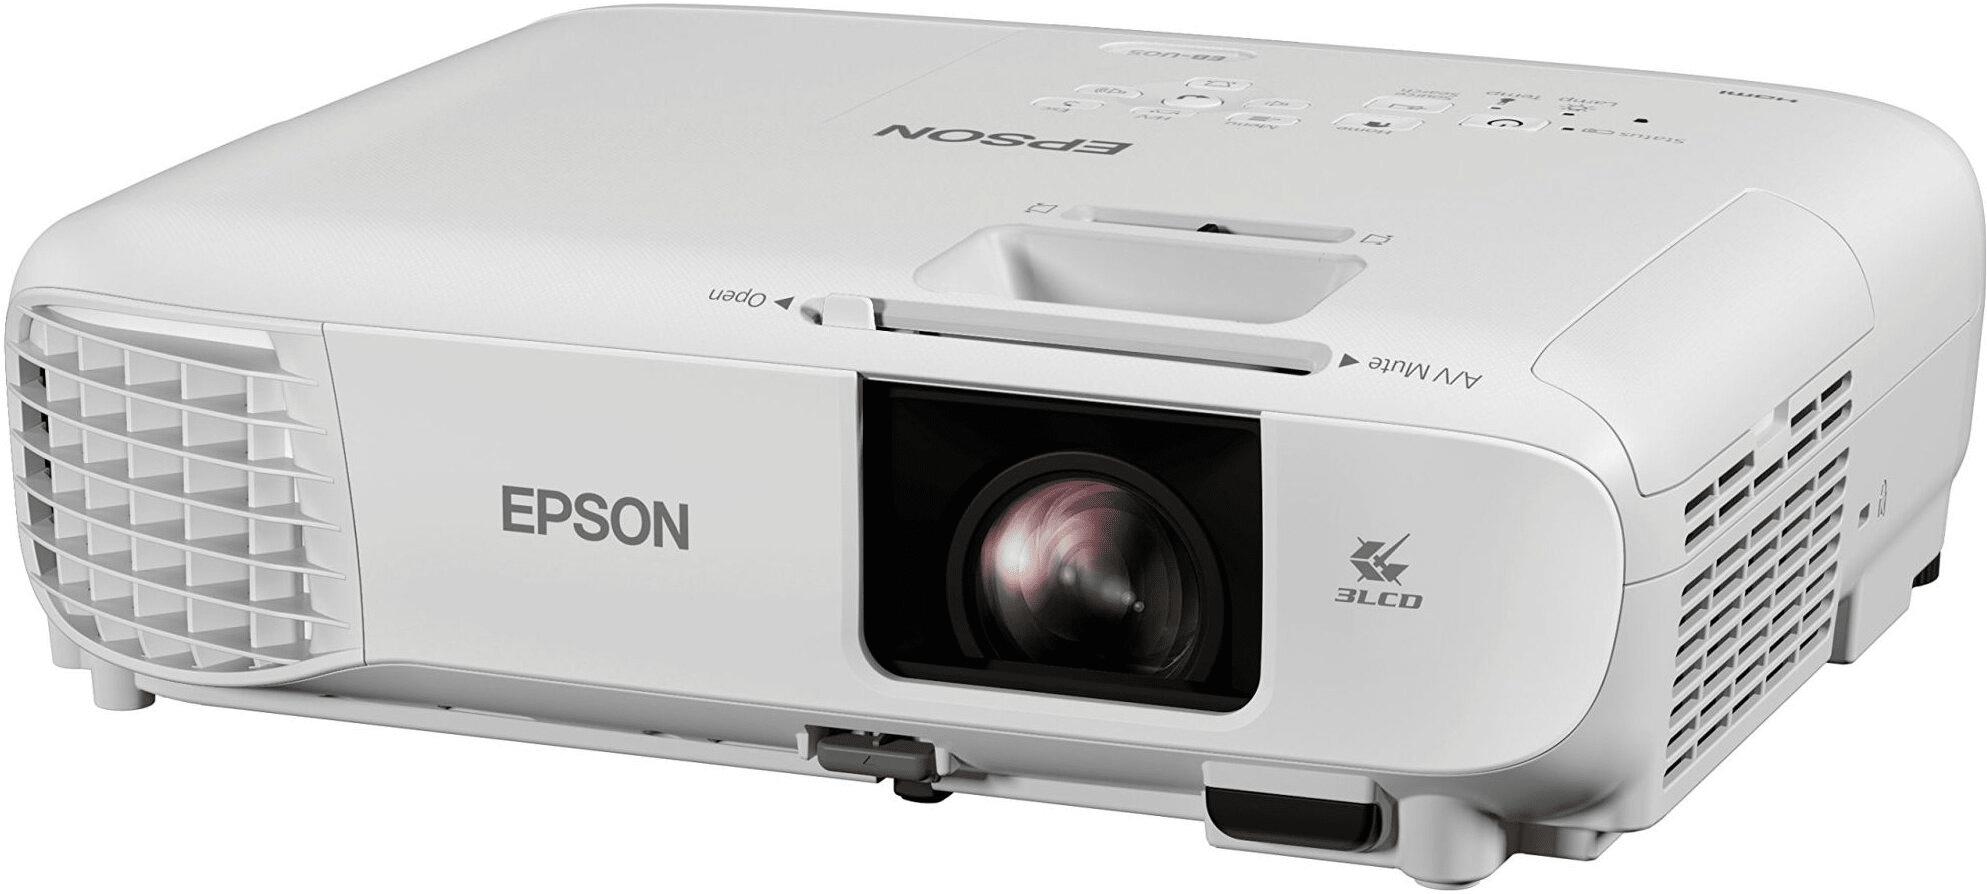 Projektor Epson EH-TW740 (V11H979040) Full HD 2 600 lm výdrž LED